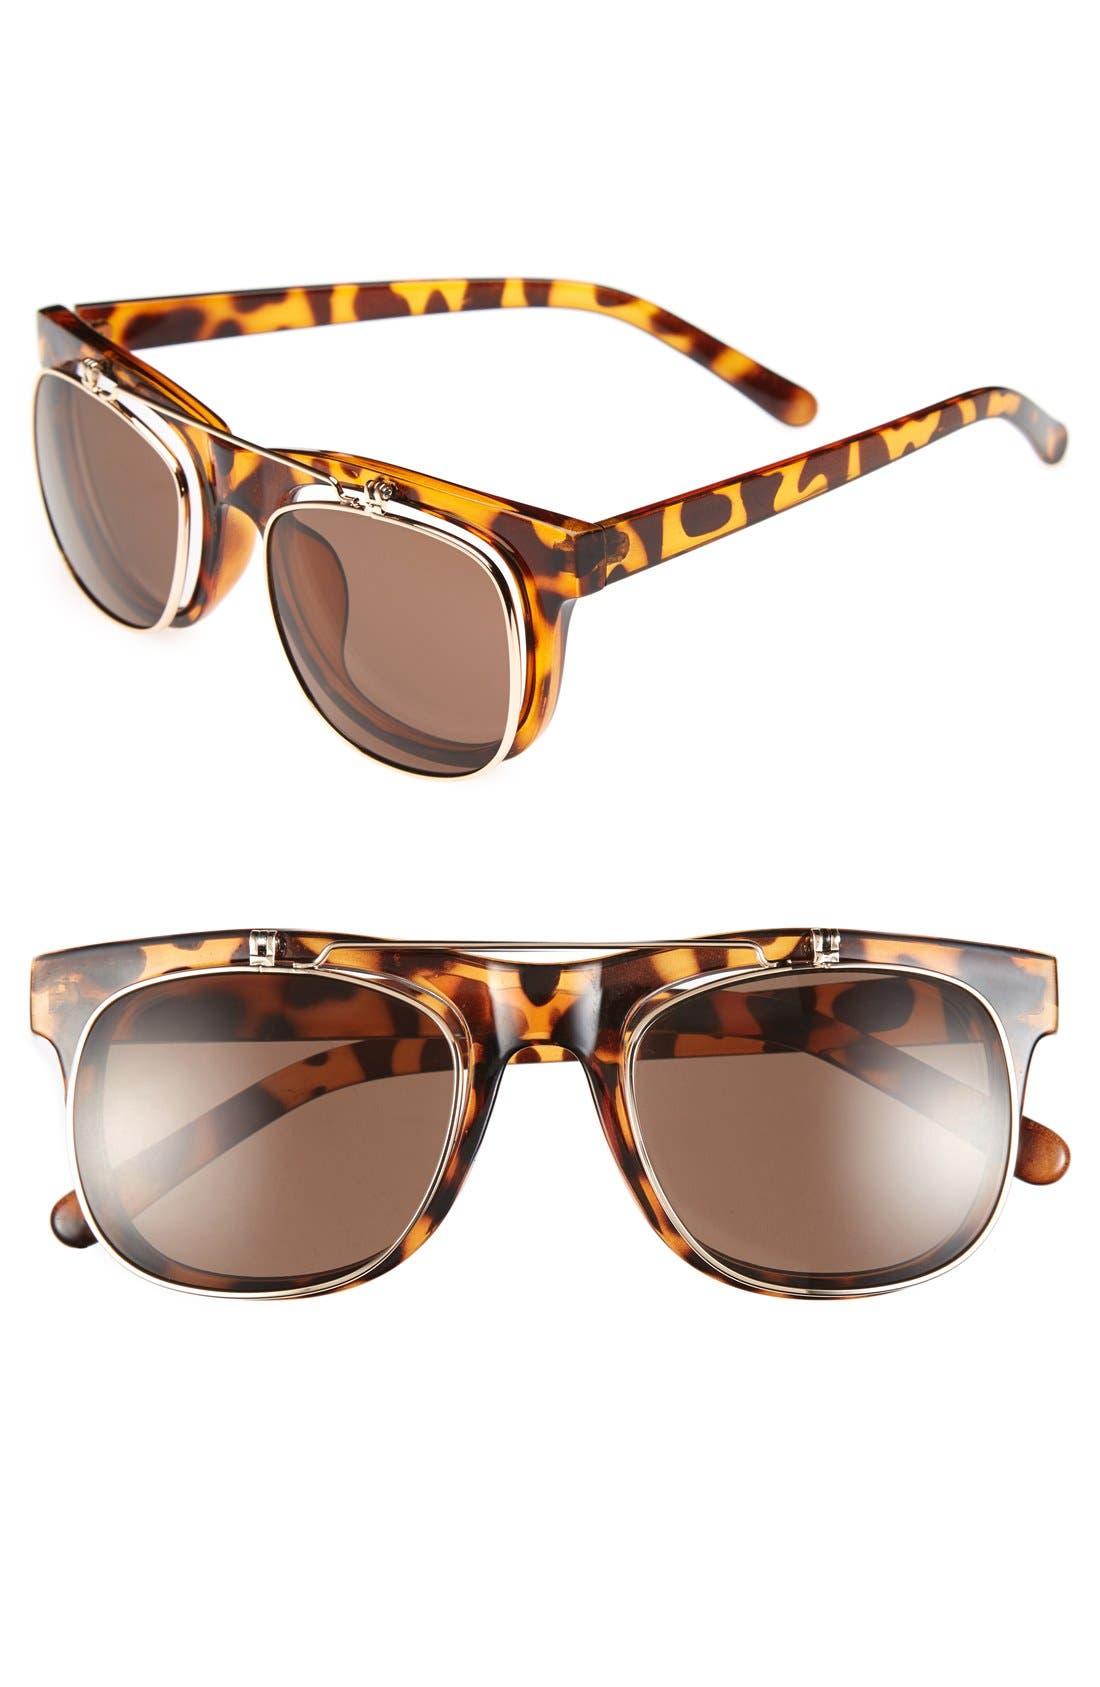 Alternate Image 1 Selected - FE NY 51mm Flip-Up Sunglasses